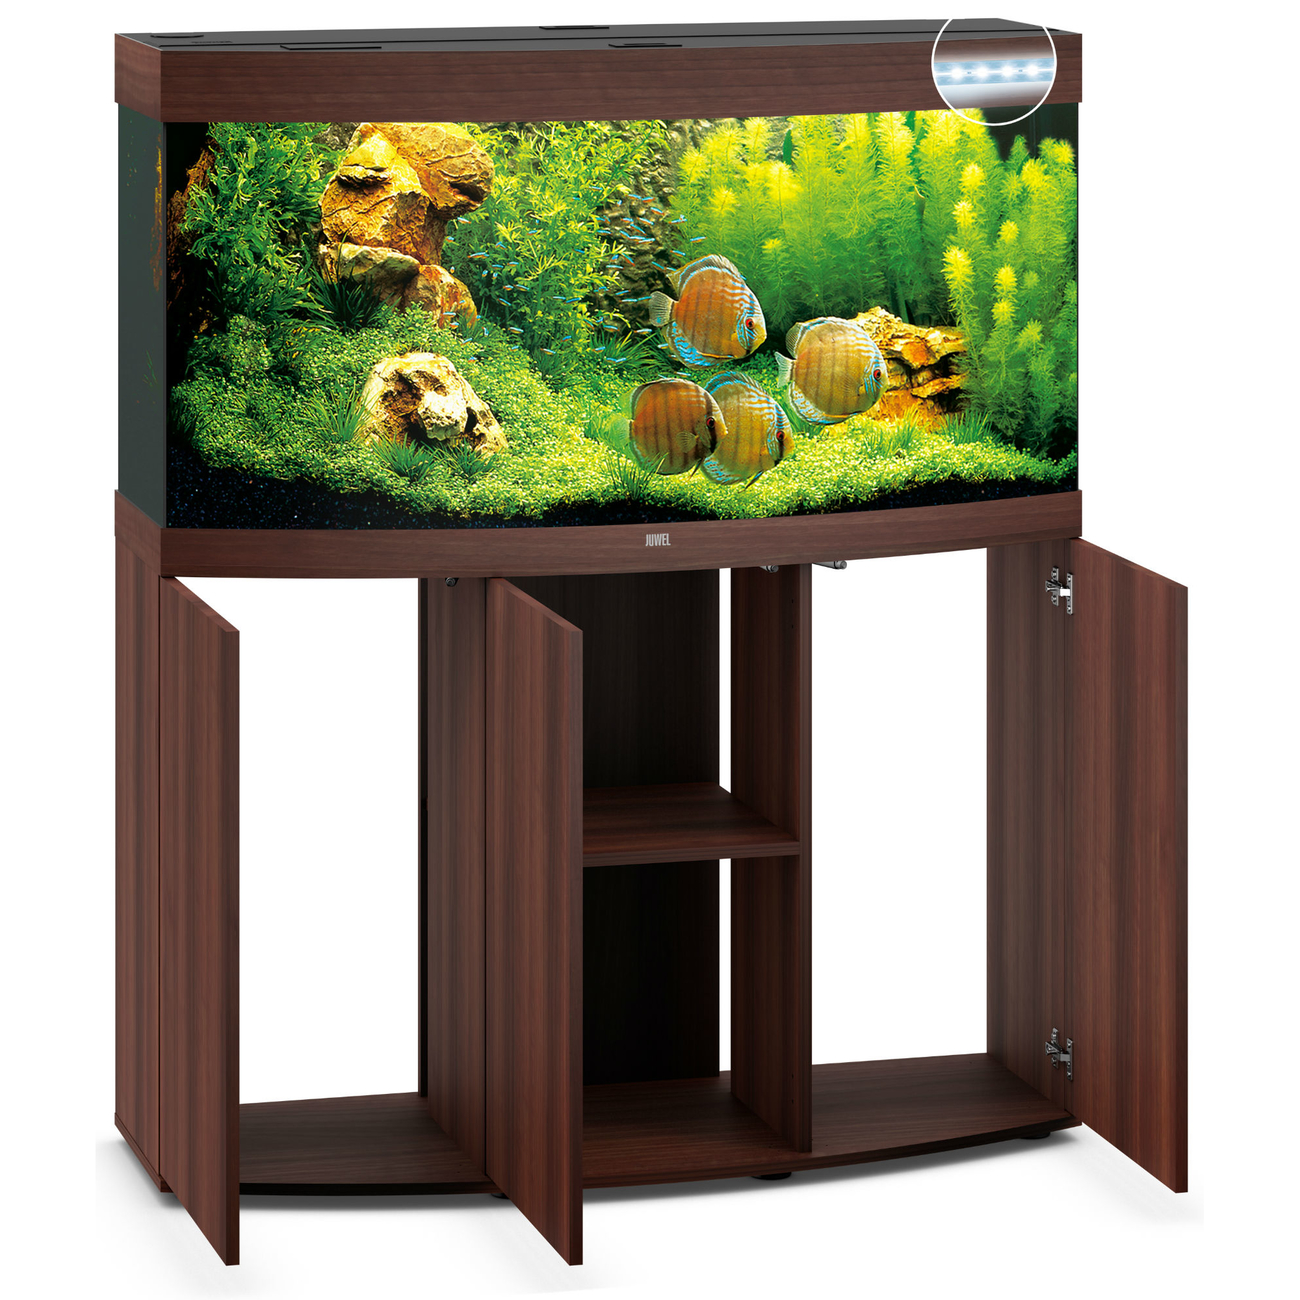 Juwel Vision 260 LED Aquarium mit Unterschrank SBX, Bild 13